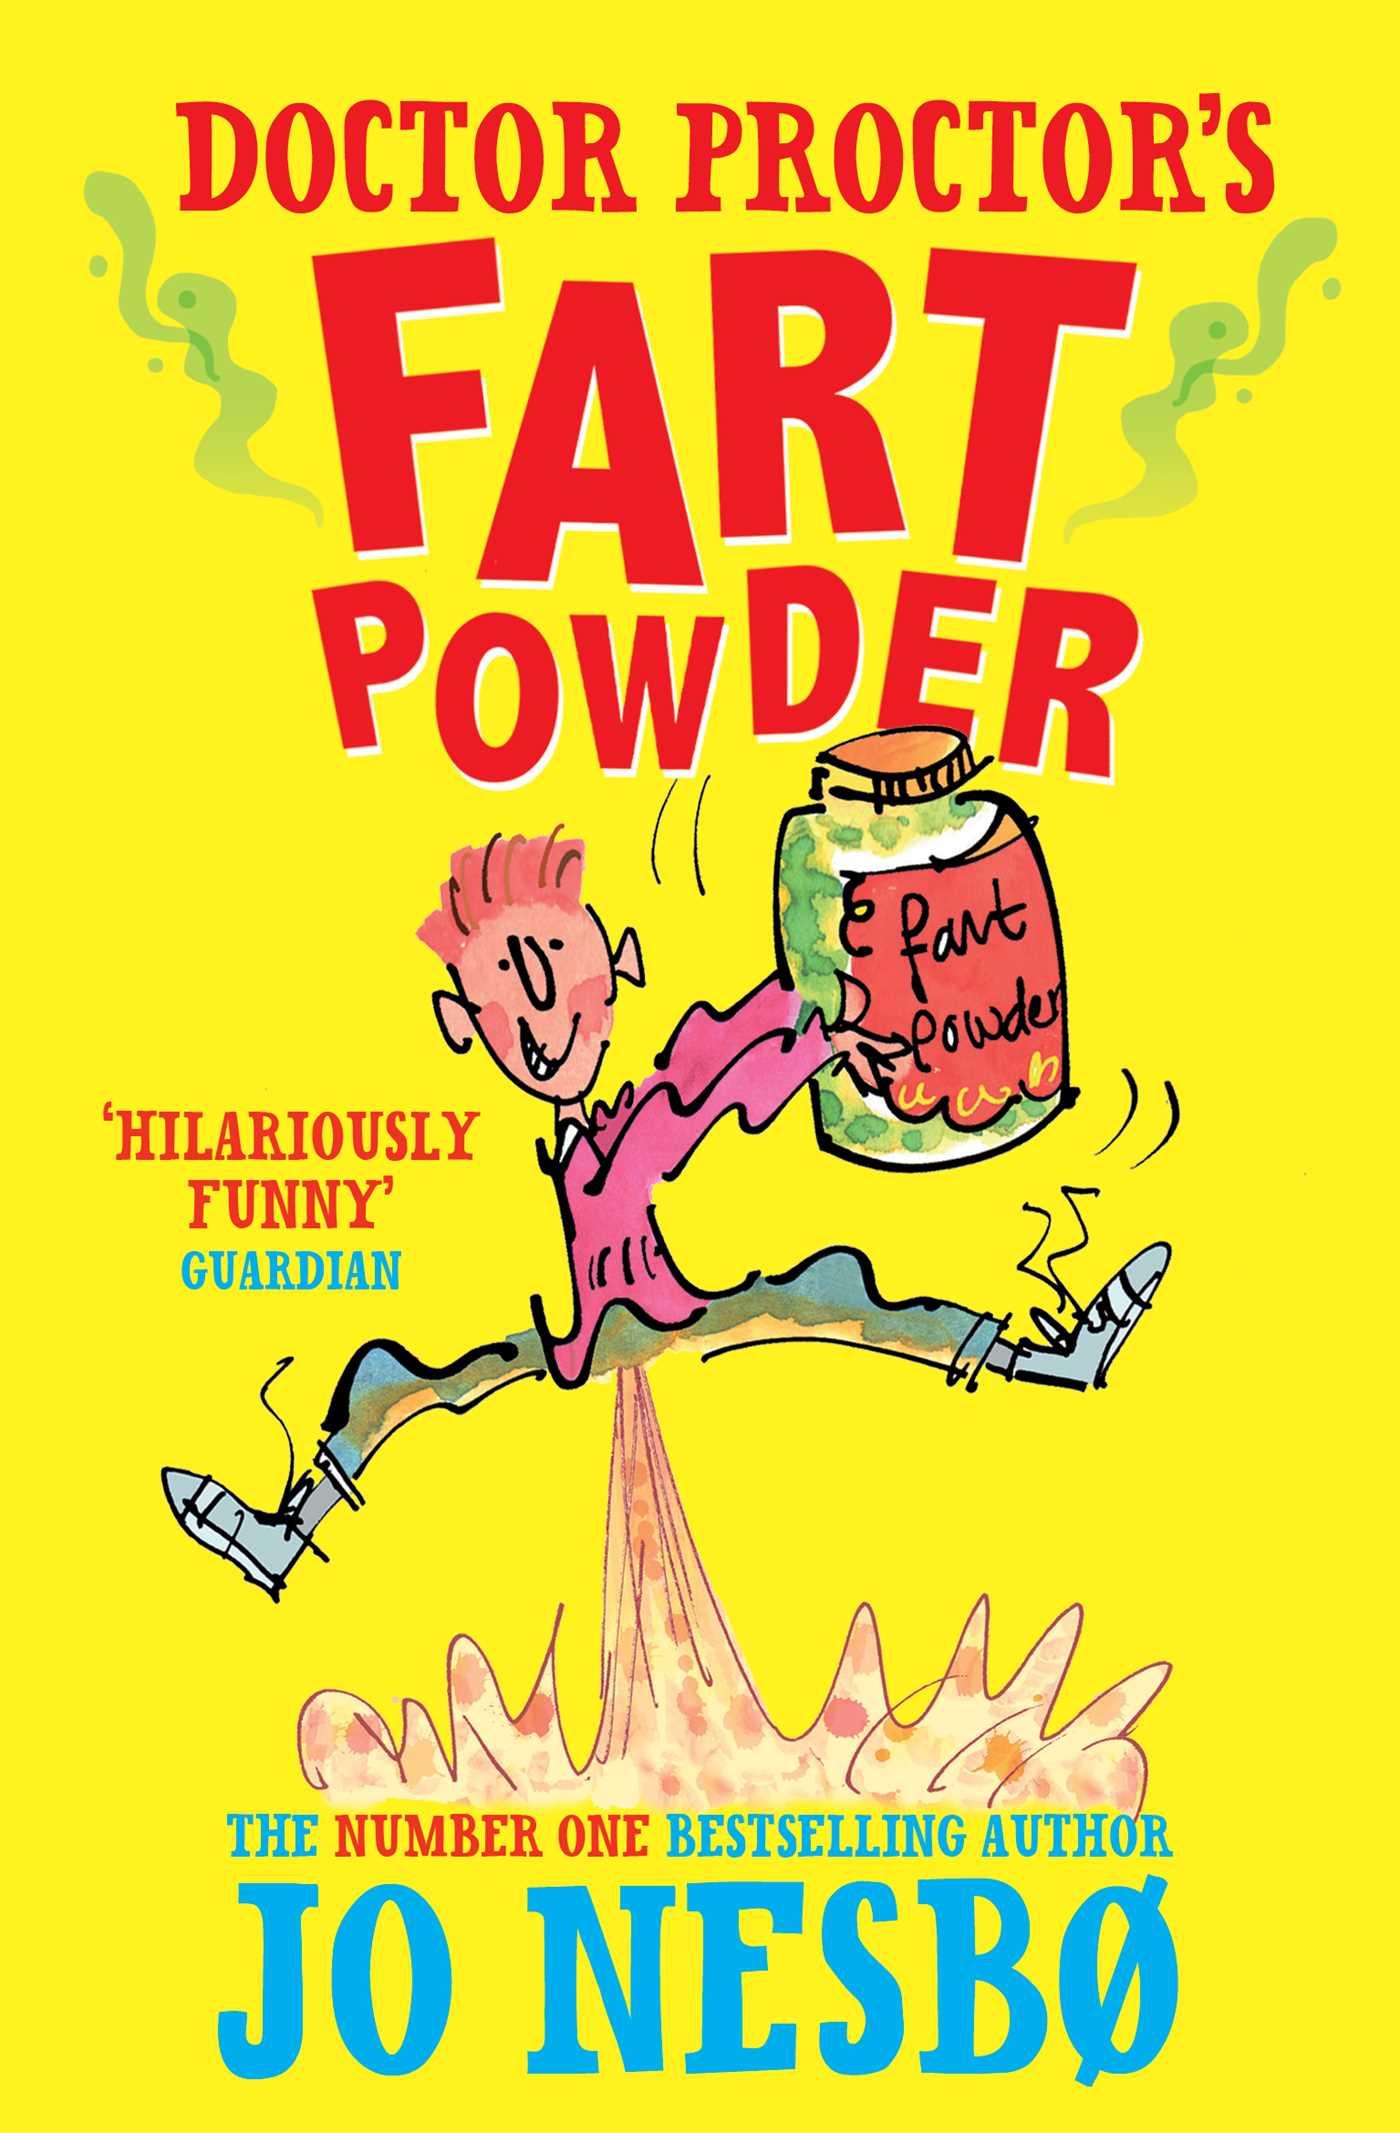 Doctor proctors fart powder 9781471171321 hr